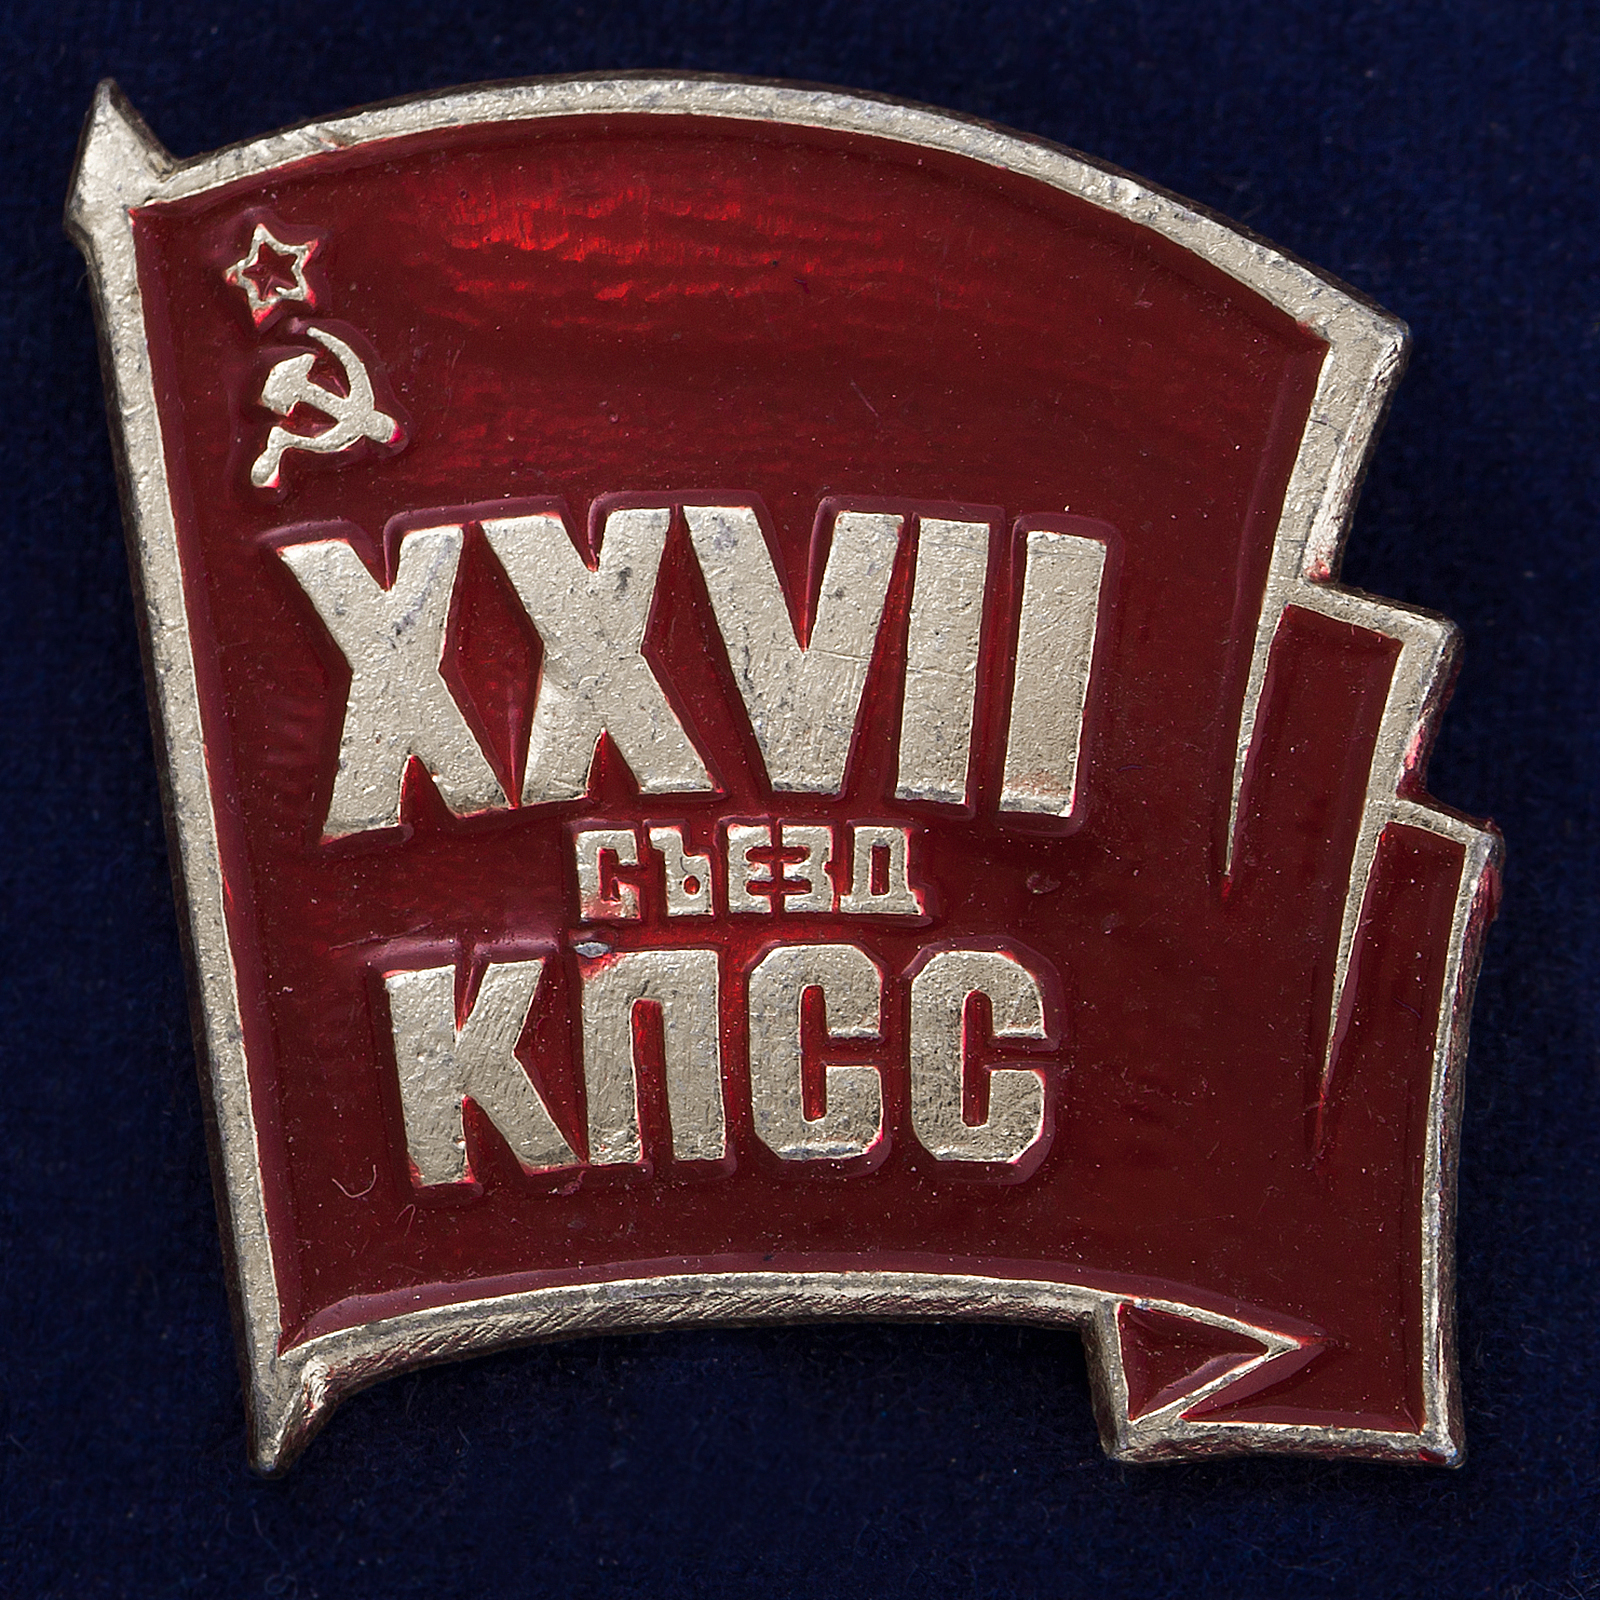 Значок на XXVII съезд КПСС